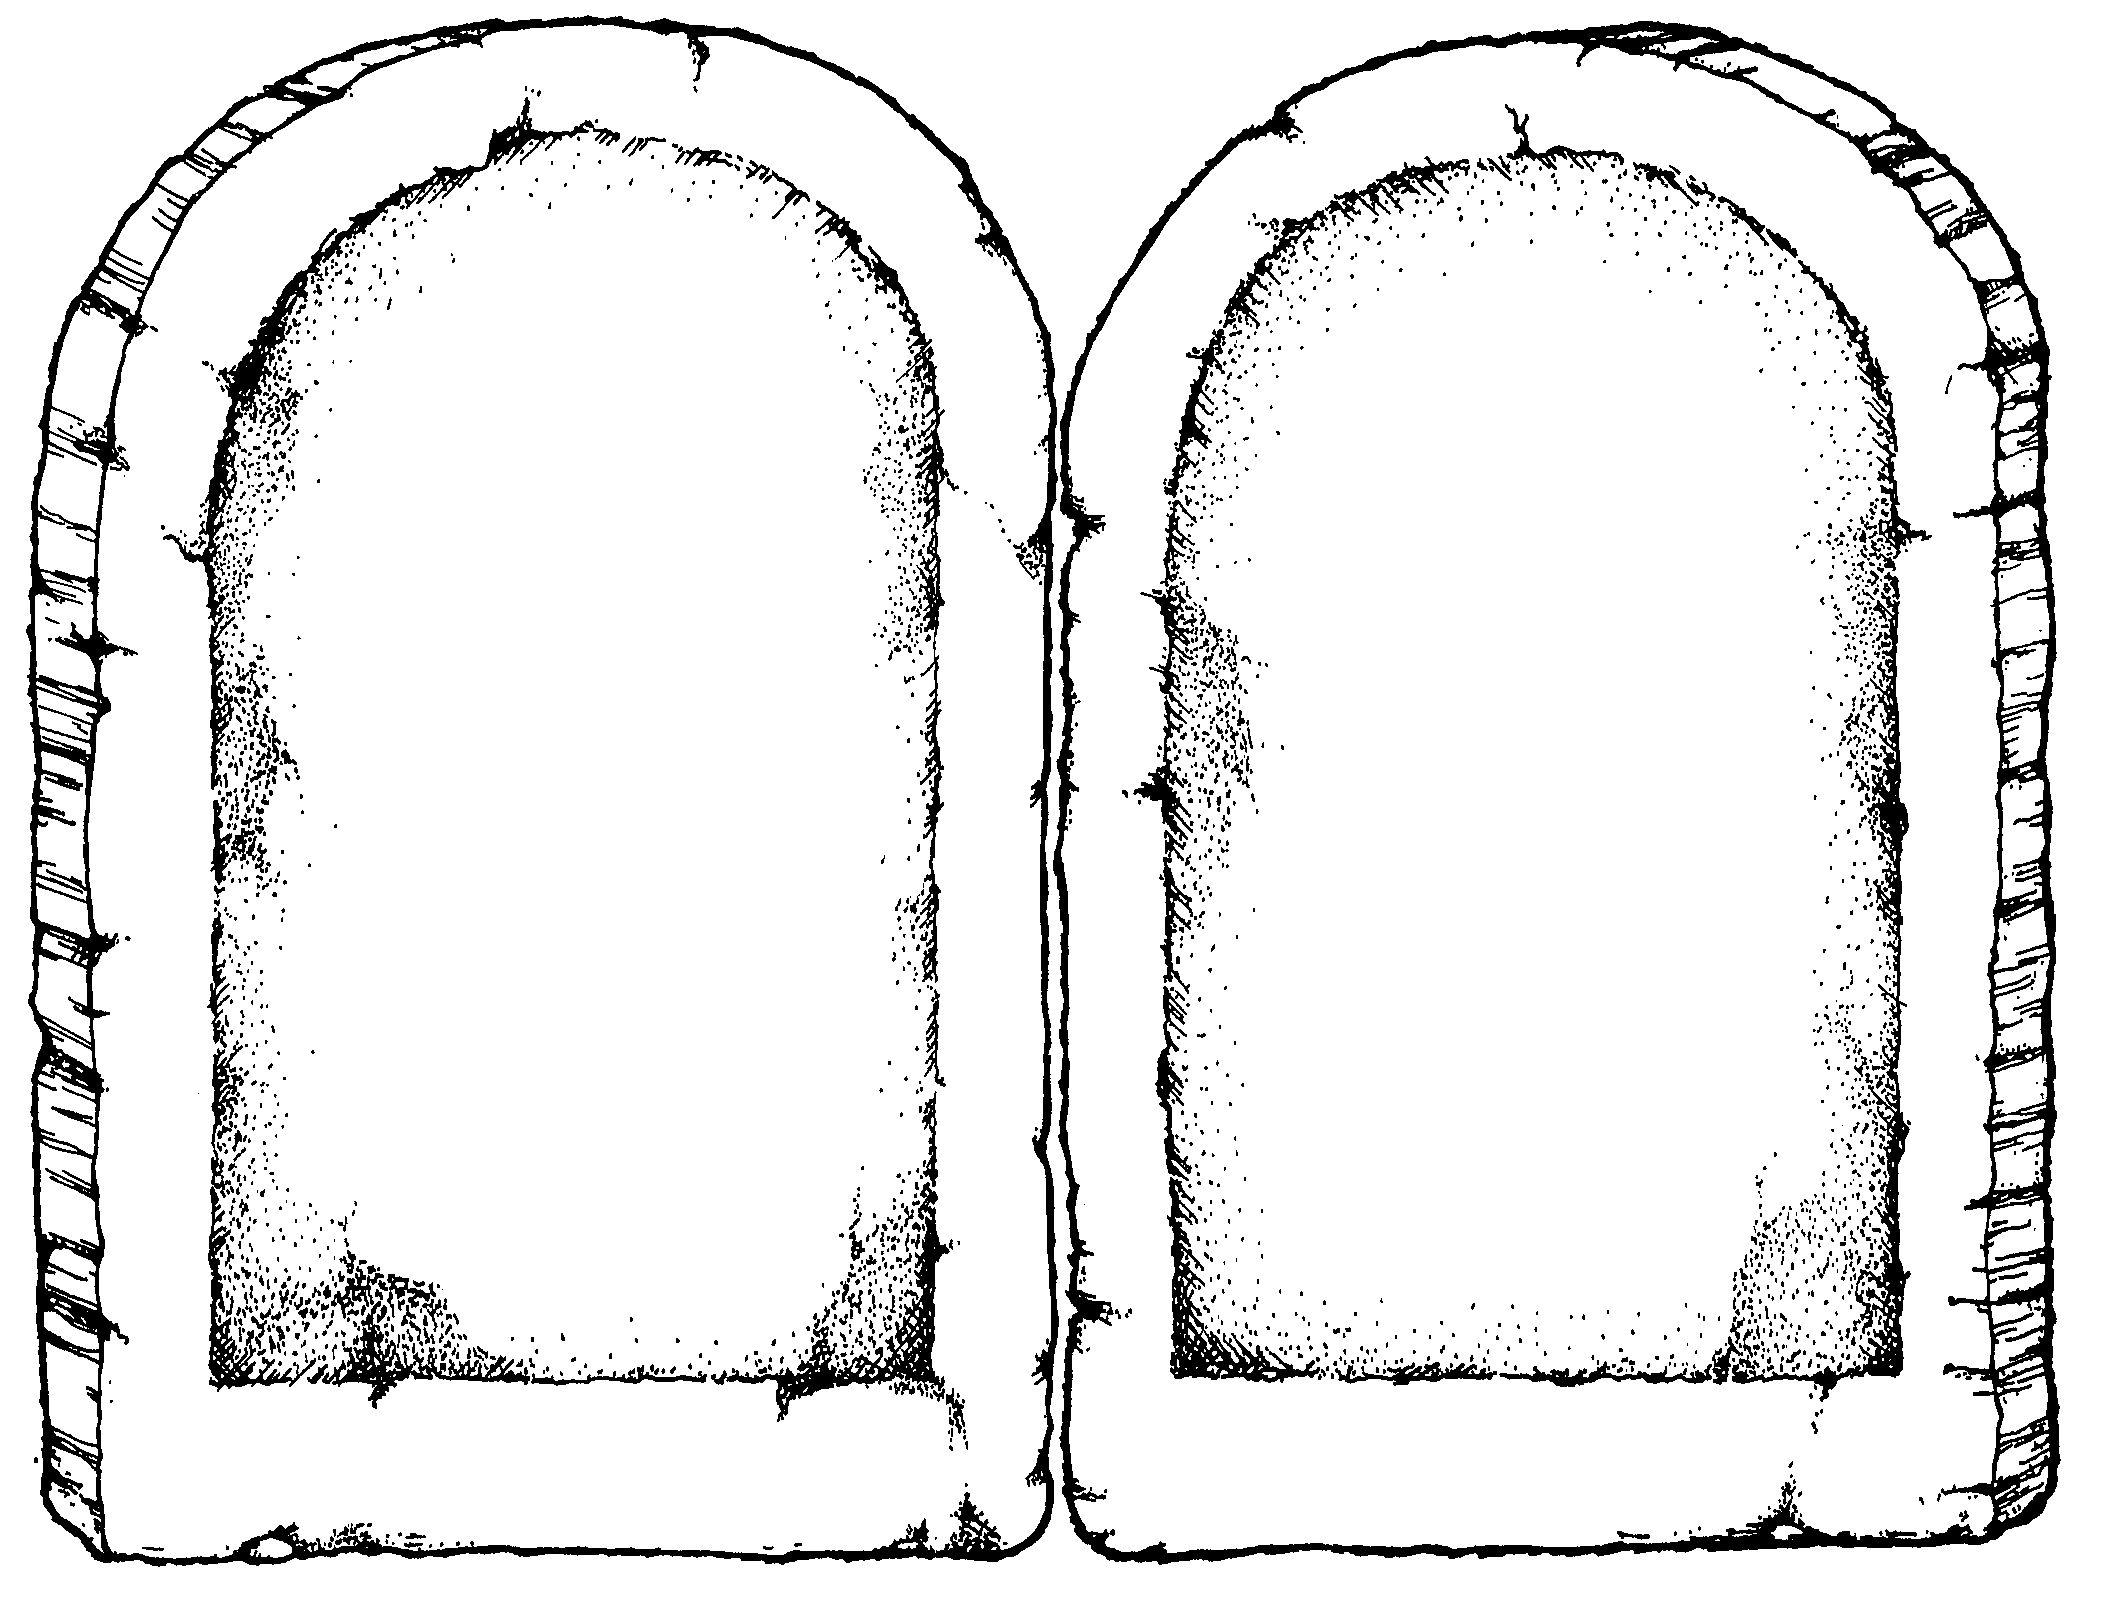 Ten commandments clipart blank. Mormon share stone tablets